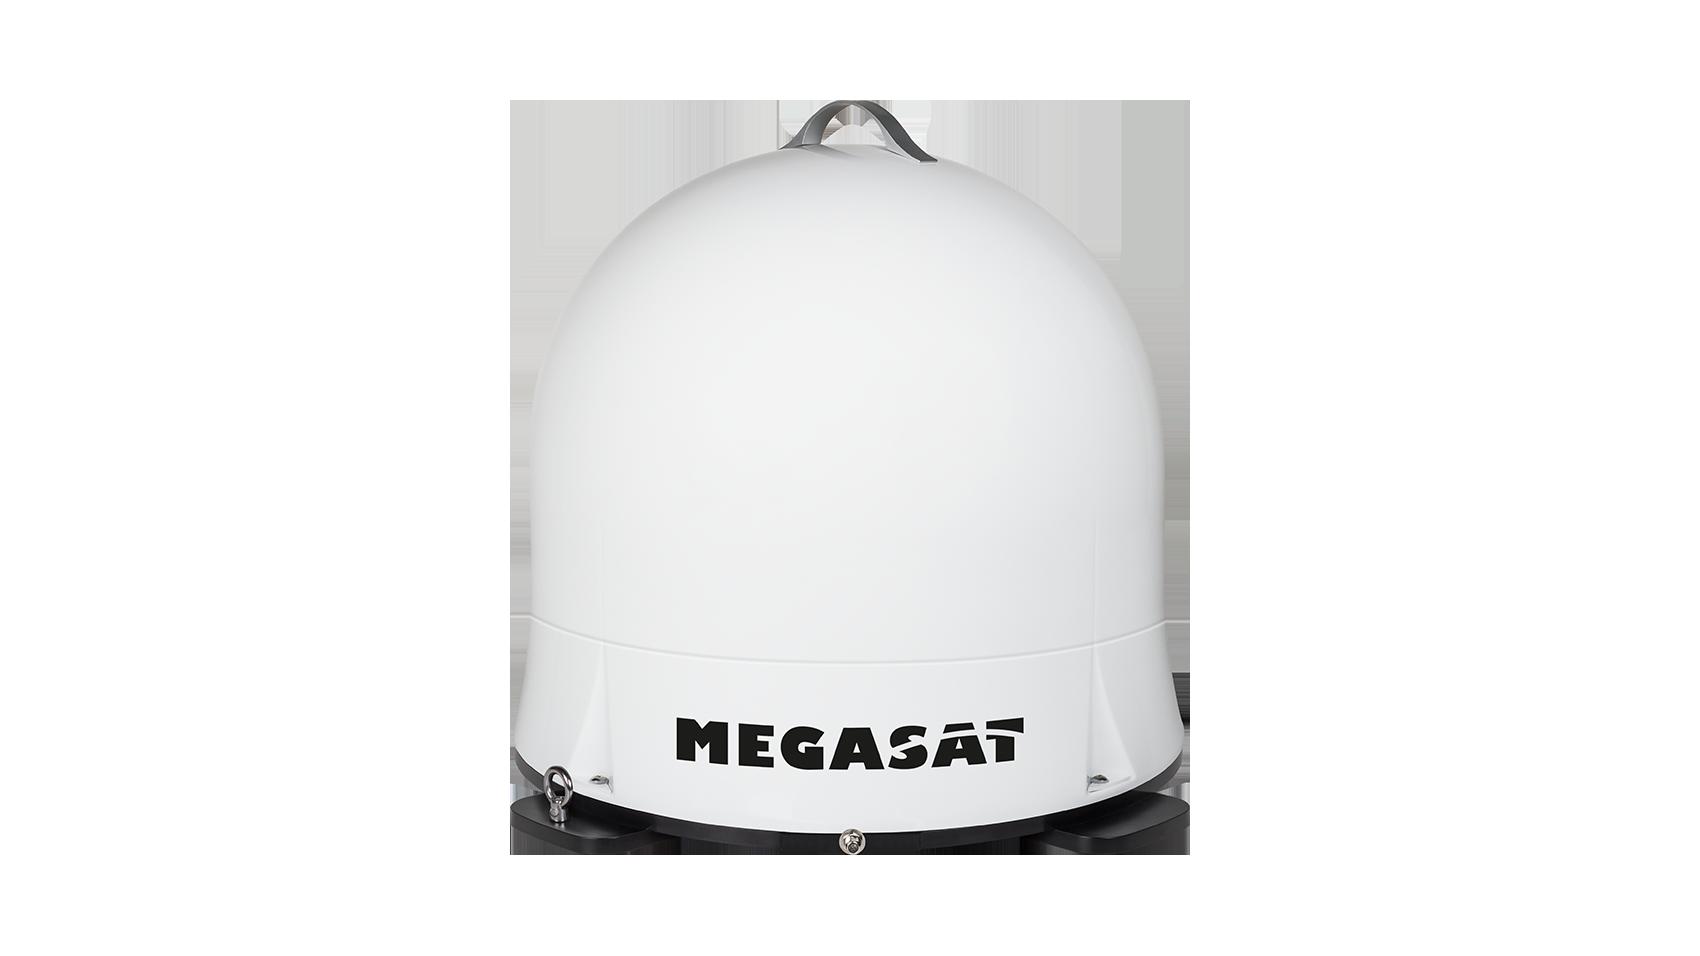 megasat_campingman_portable_eco_frontansicht